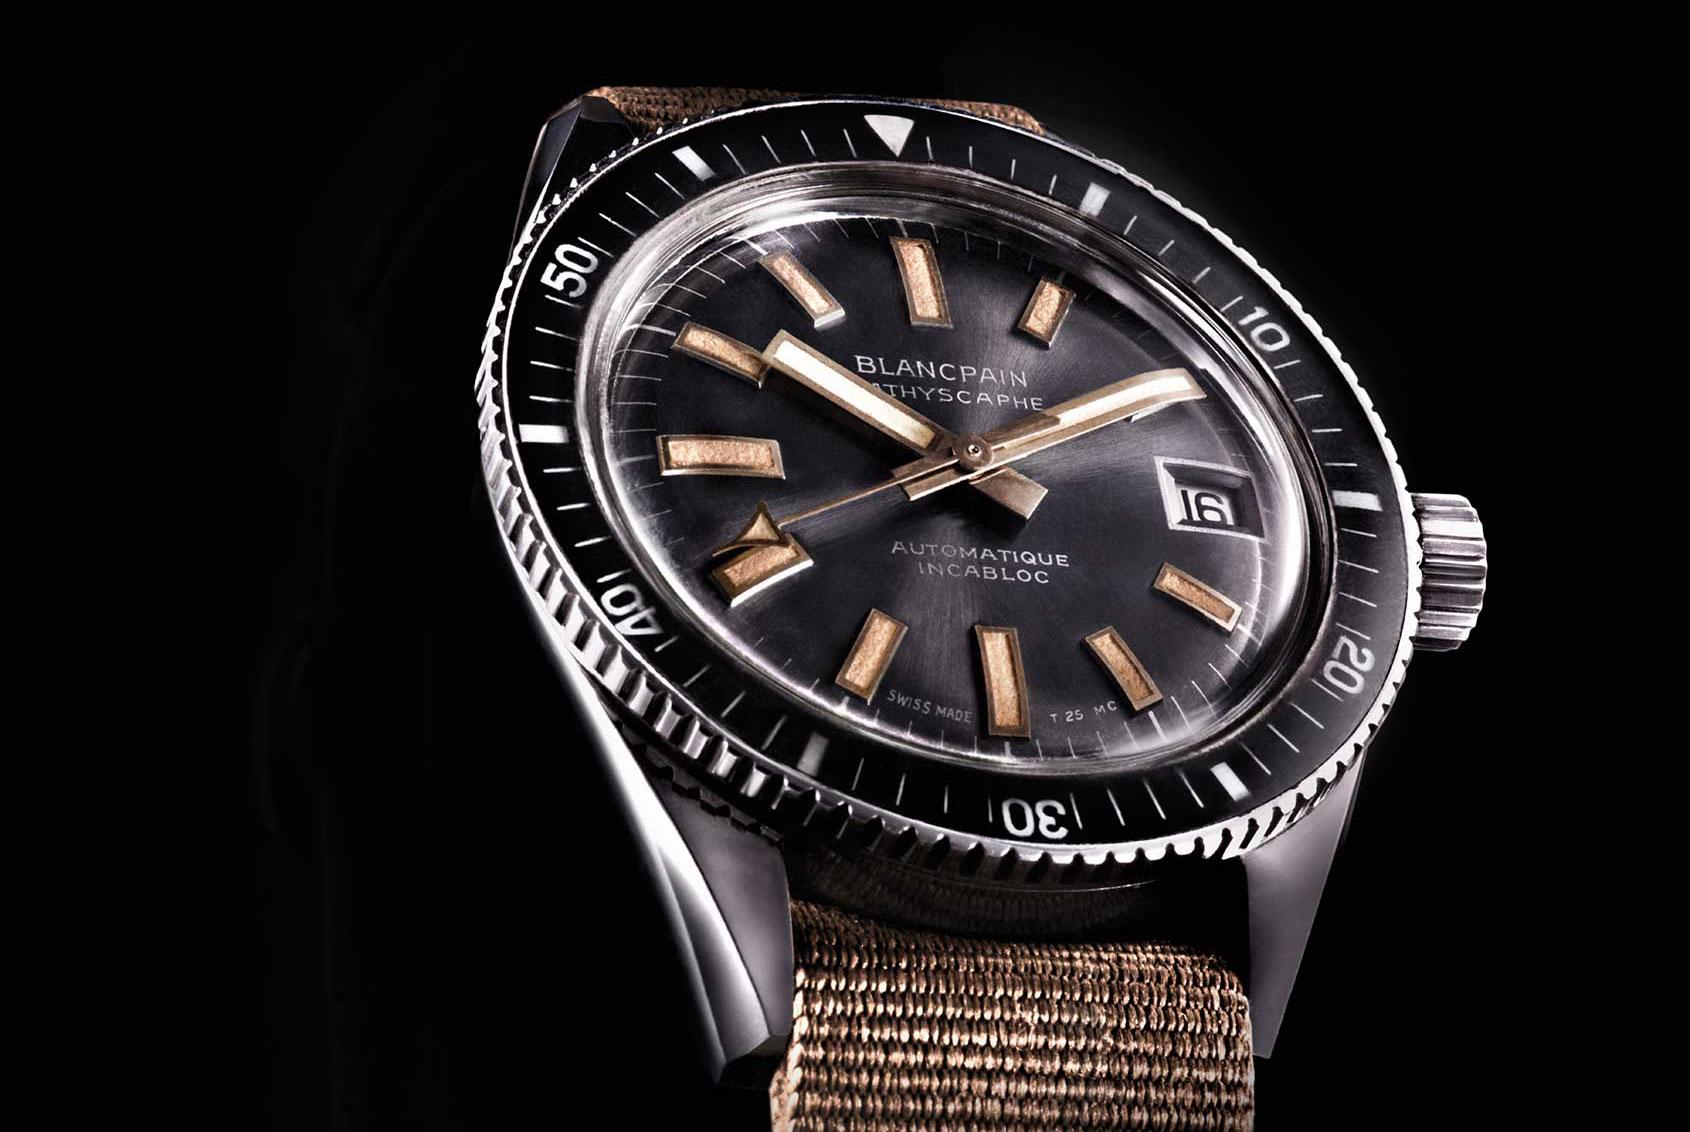 Blancpain dive watch